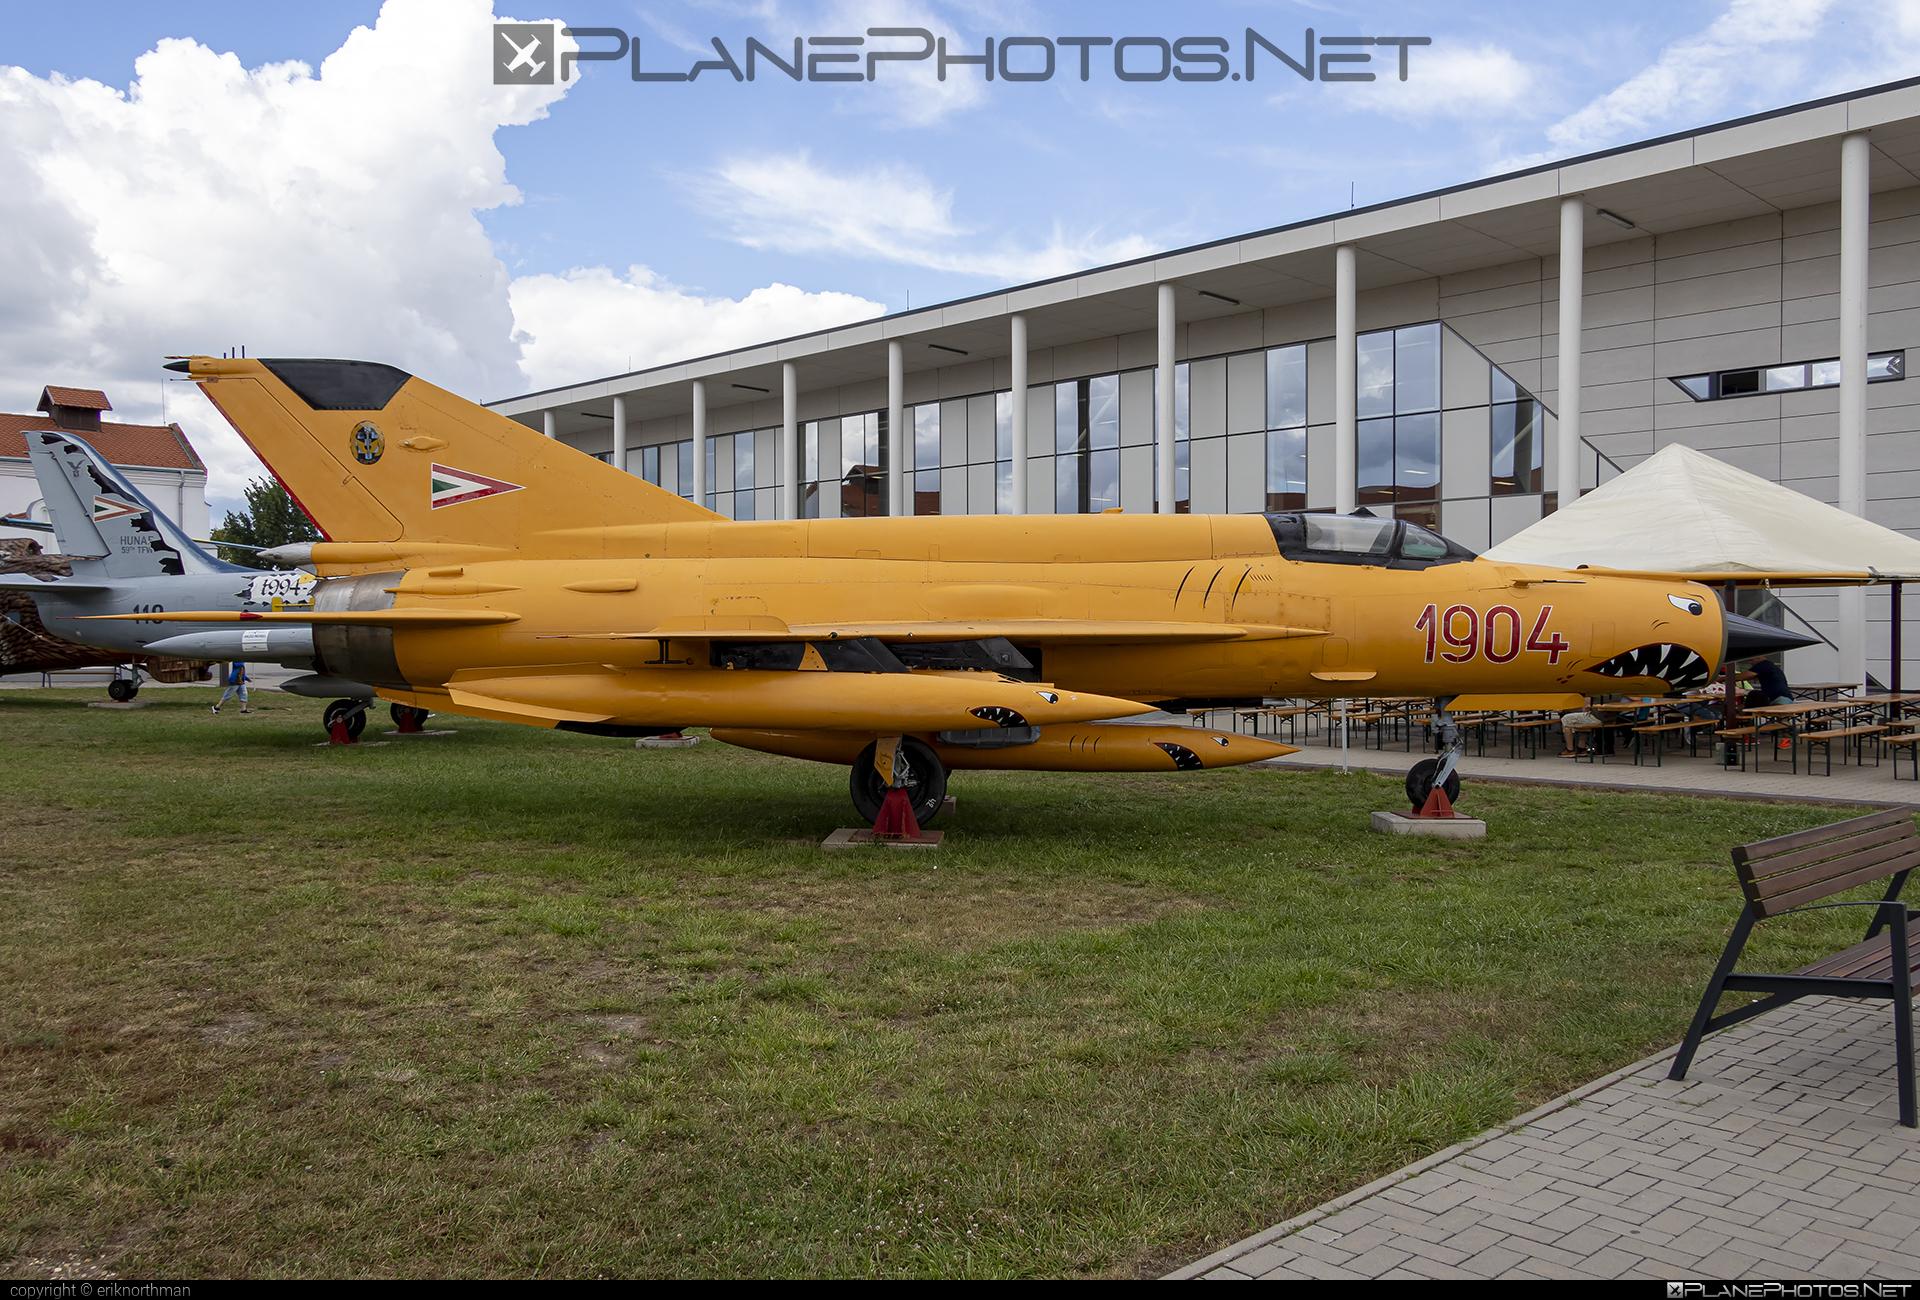 Mikoyan-Gurevich MiG-21bis - 1904 operated by Magyar Légierő (Hungarian Air Force) #hungarianairforce #magyarlegiero #mig #mig21 #mig21bis #mikoyangurevich